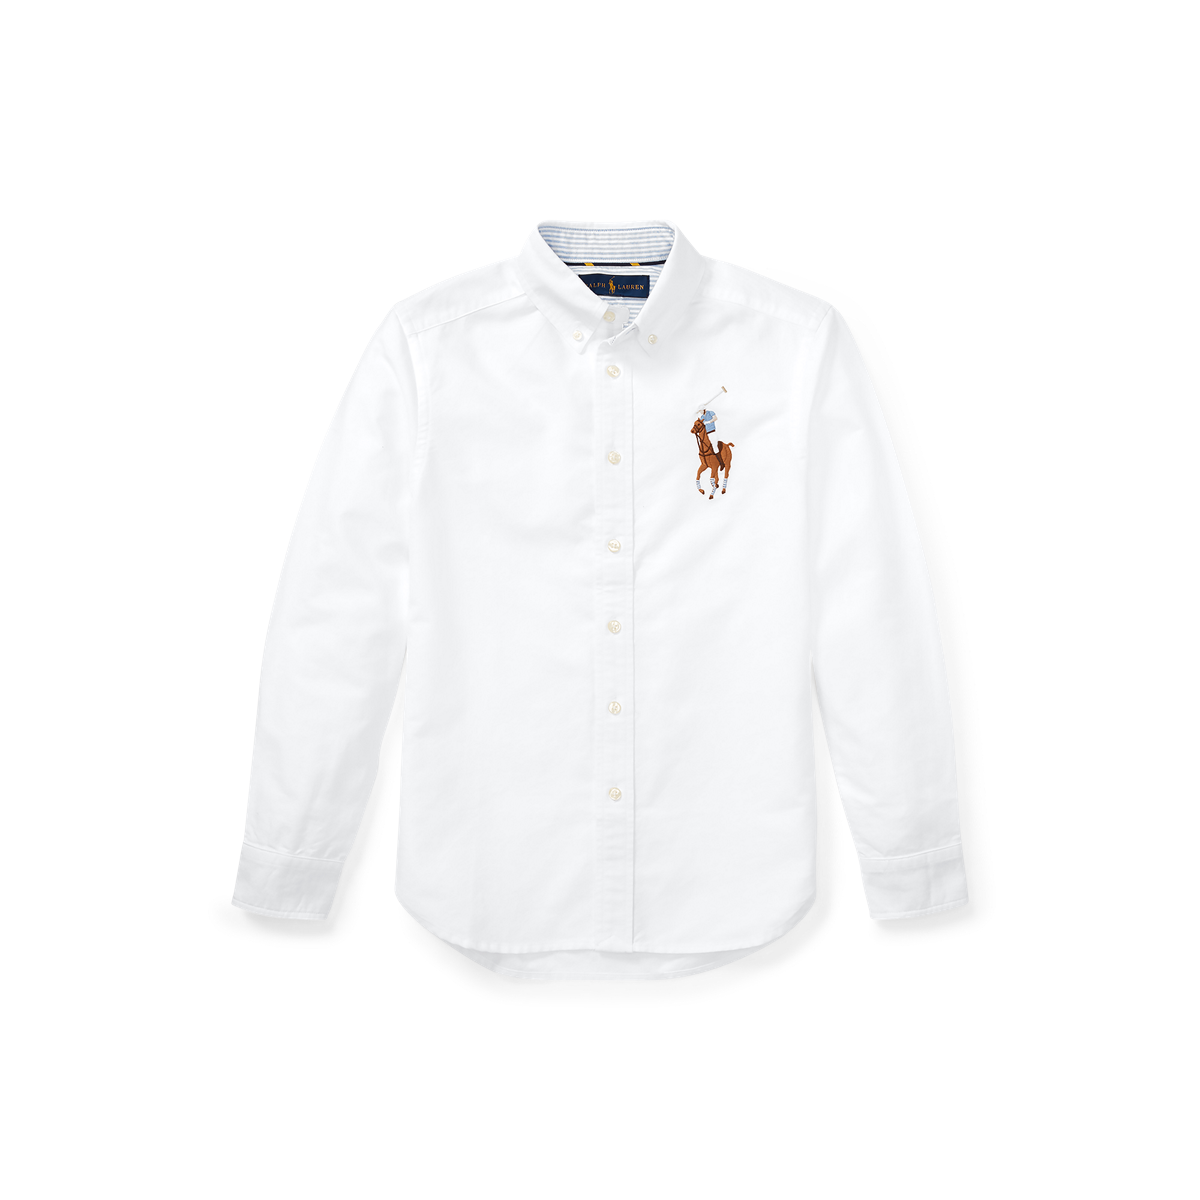 RALPH LAUREN Baby Boys Checked Cotton Oxford Shirt